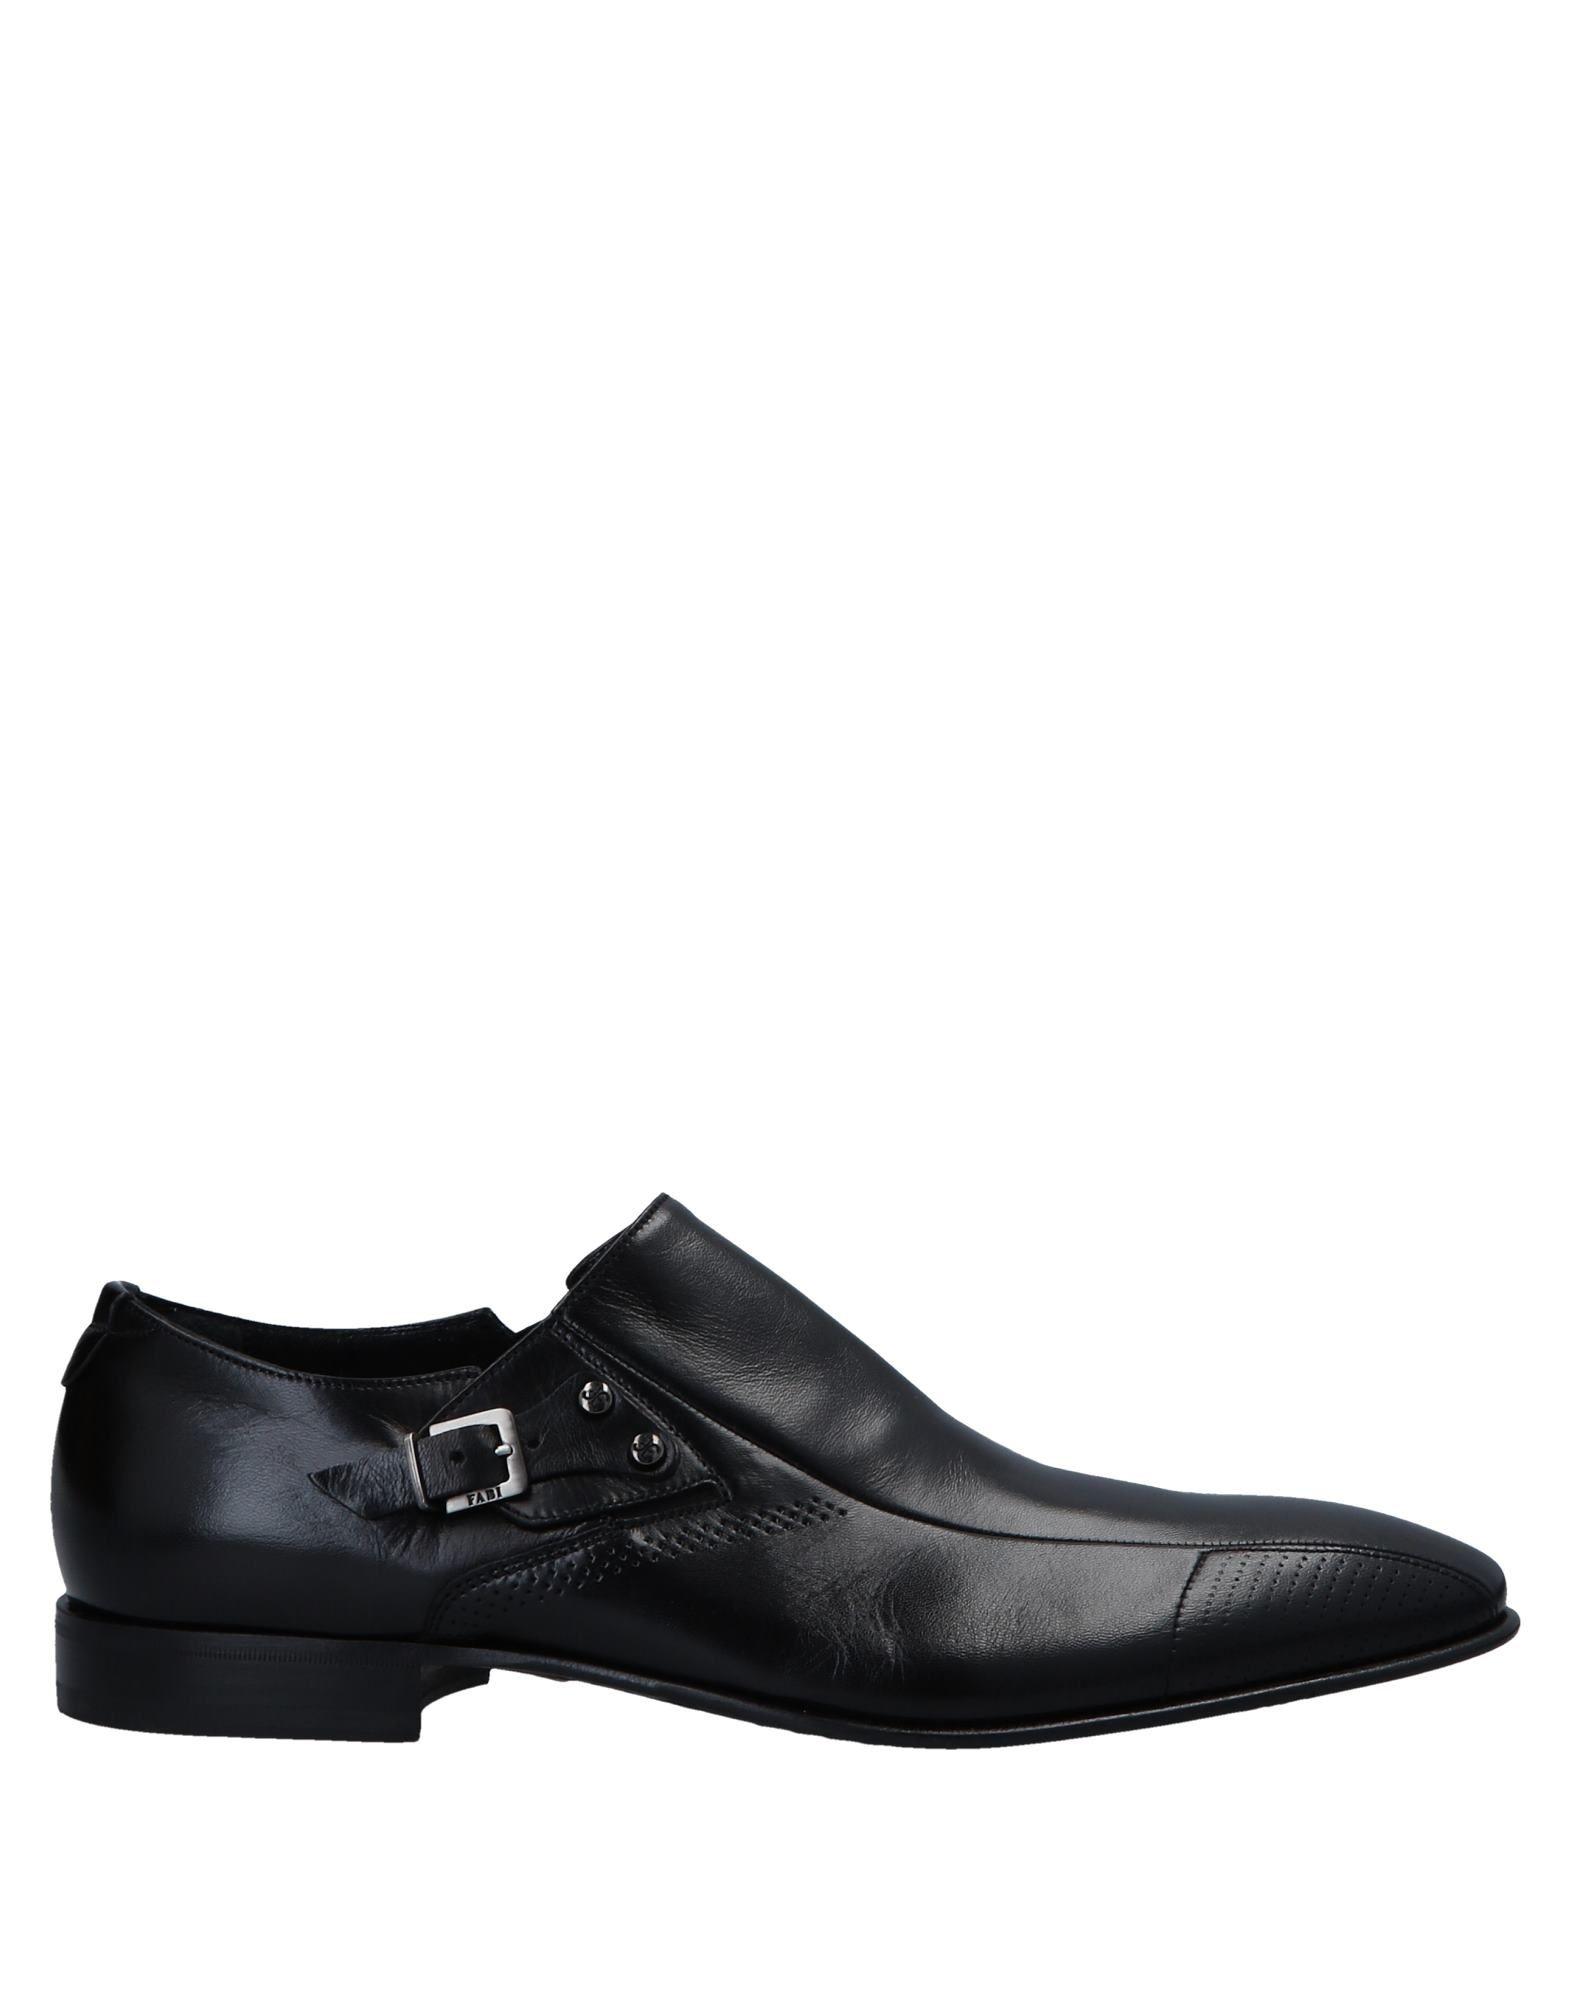 Fabi Mokassins Herren  11547793HK Gute Qualität beliebte Schuhe